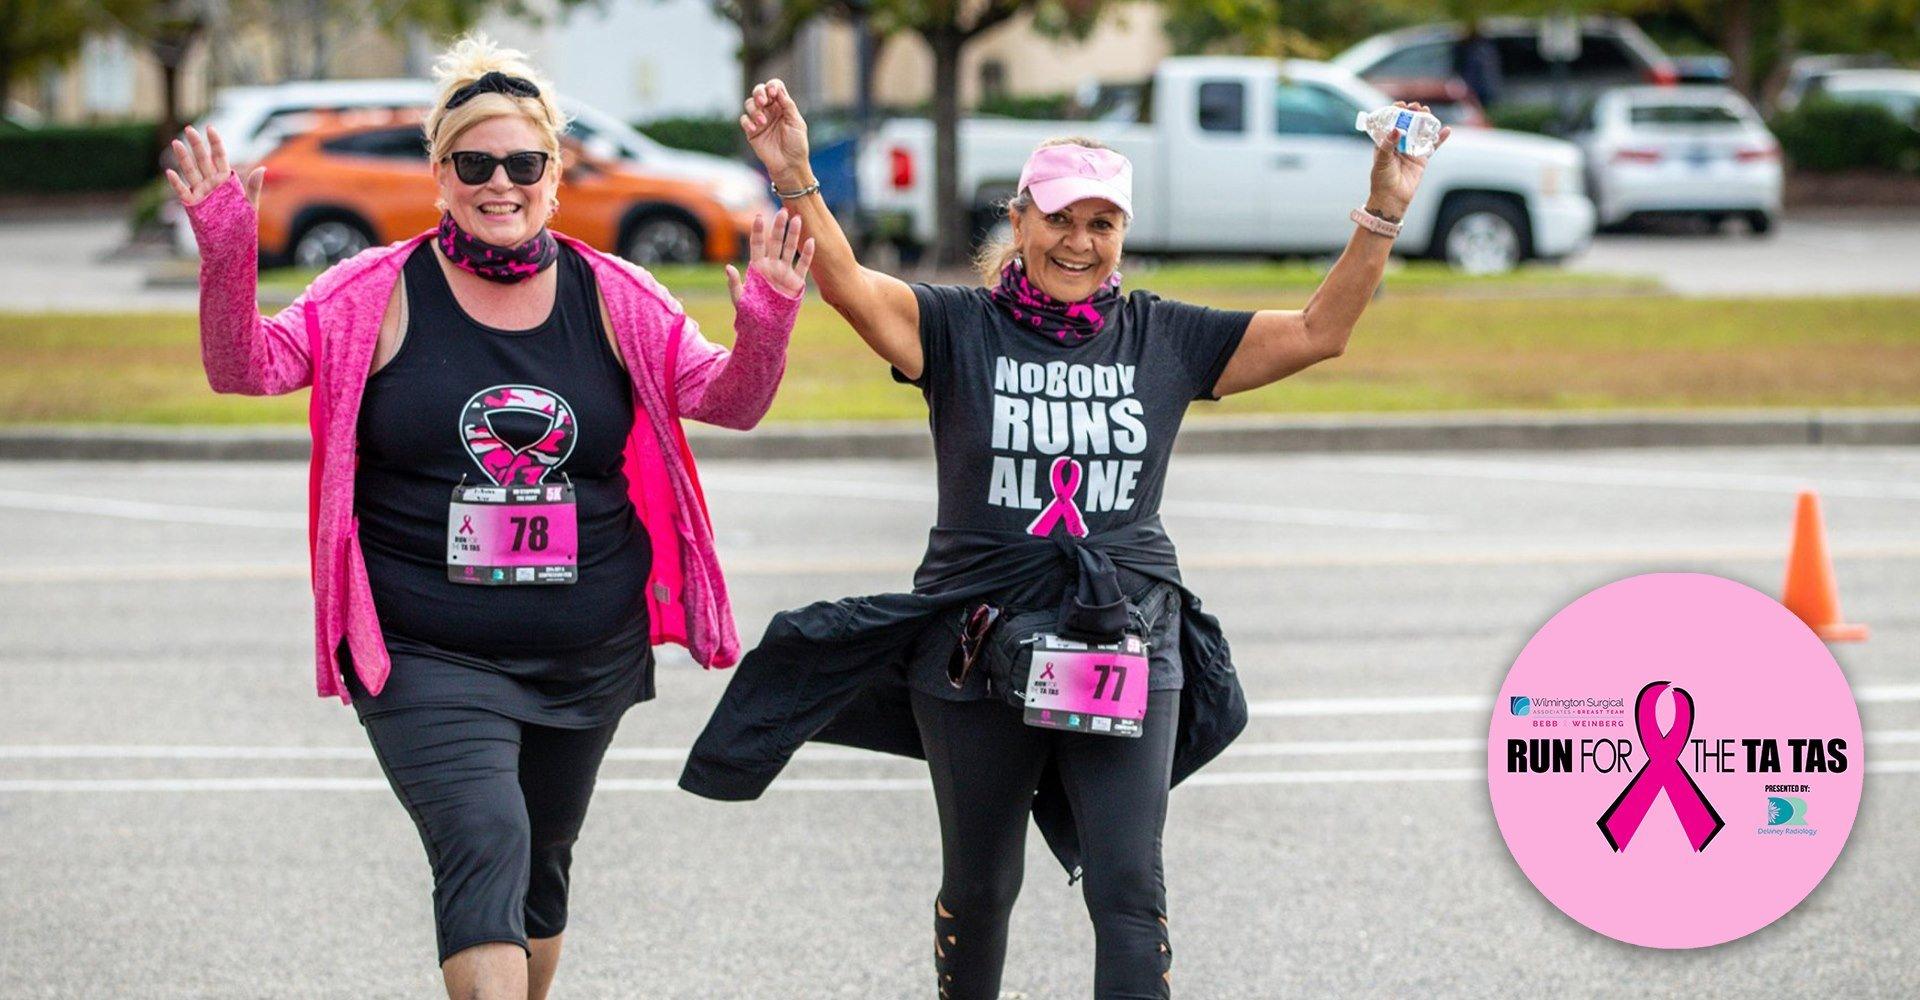 Run for the Ta Tas - Wilmington, NC